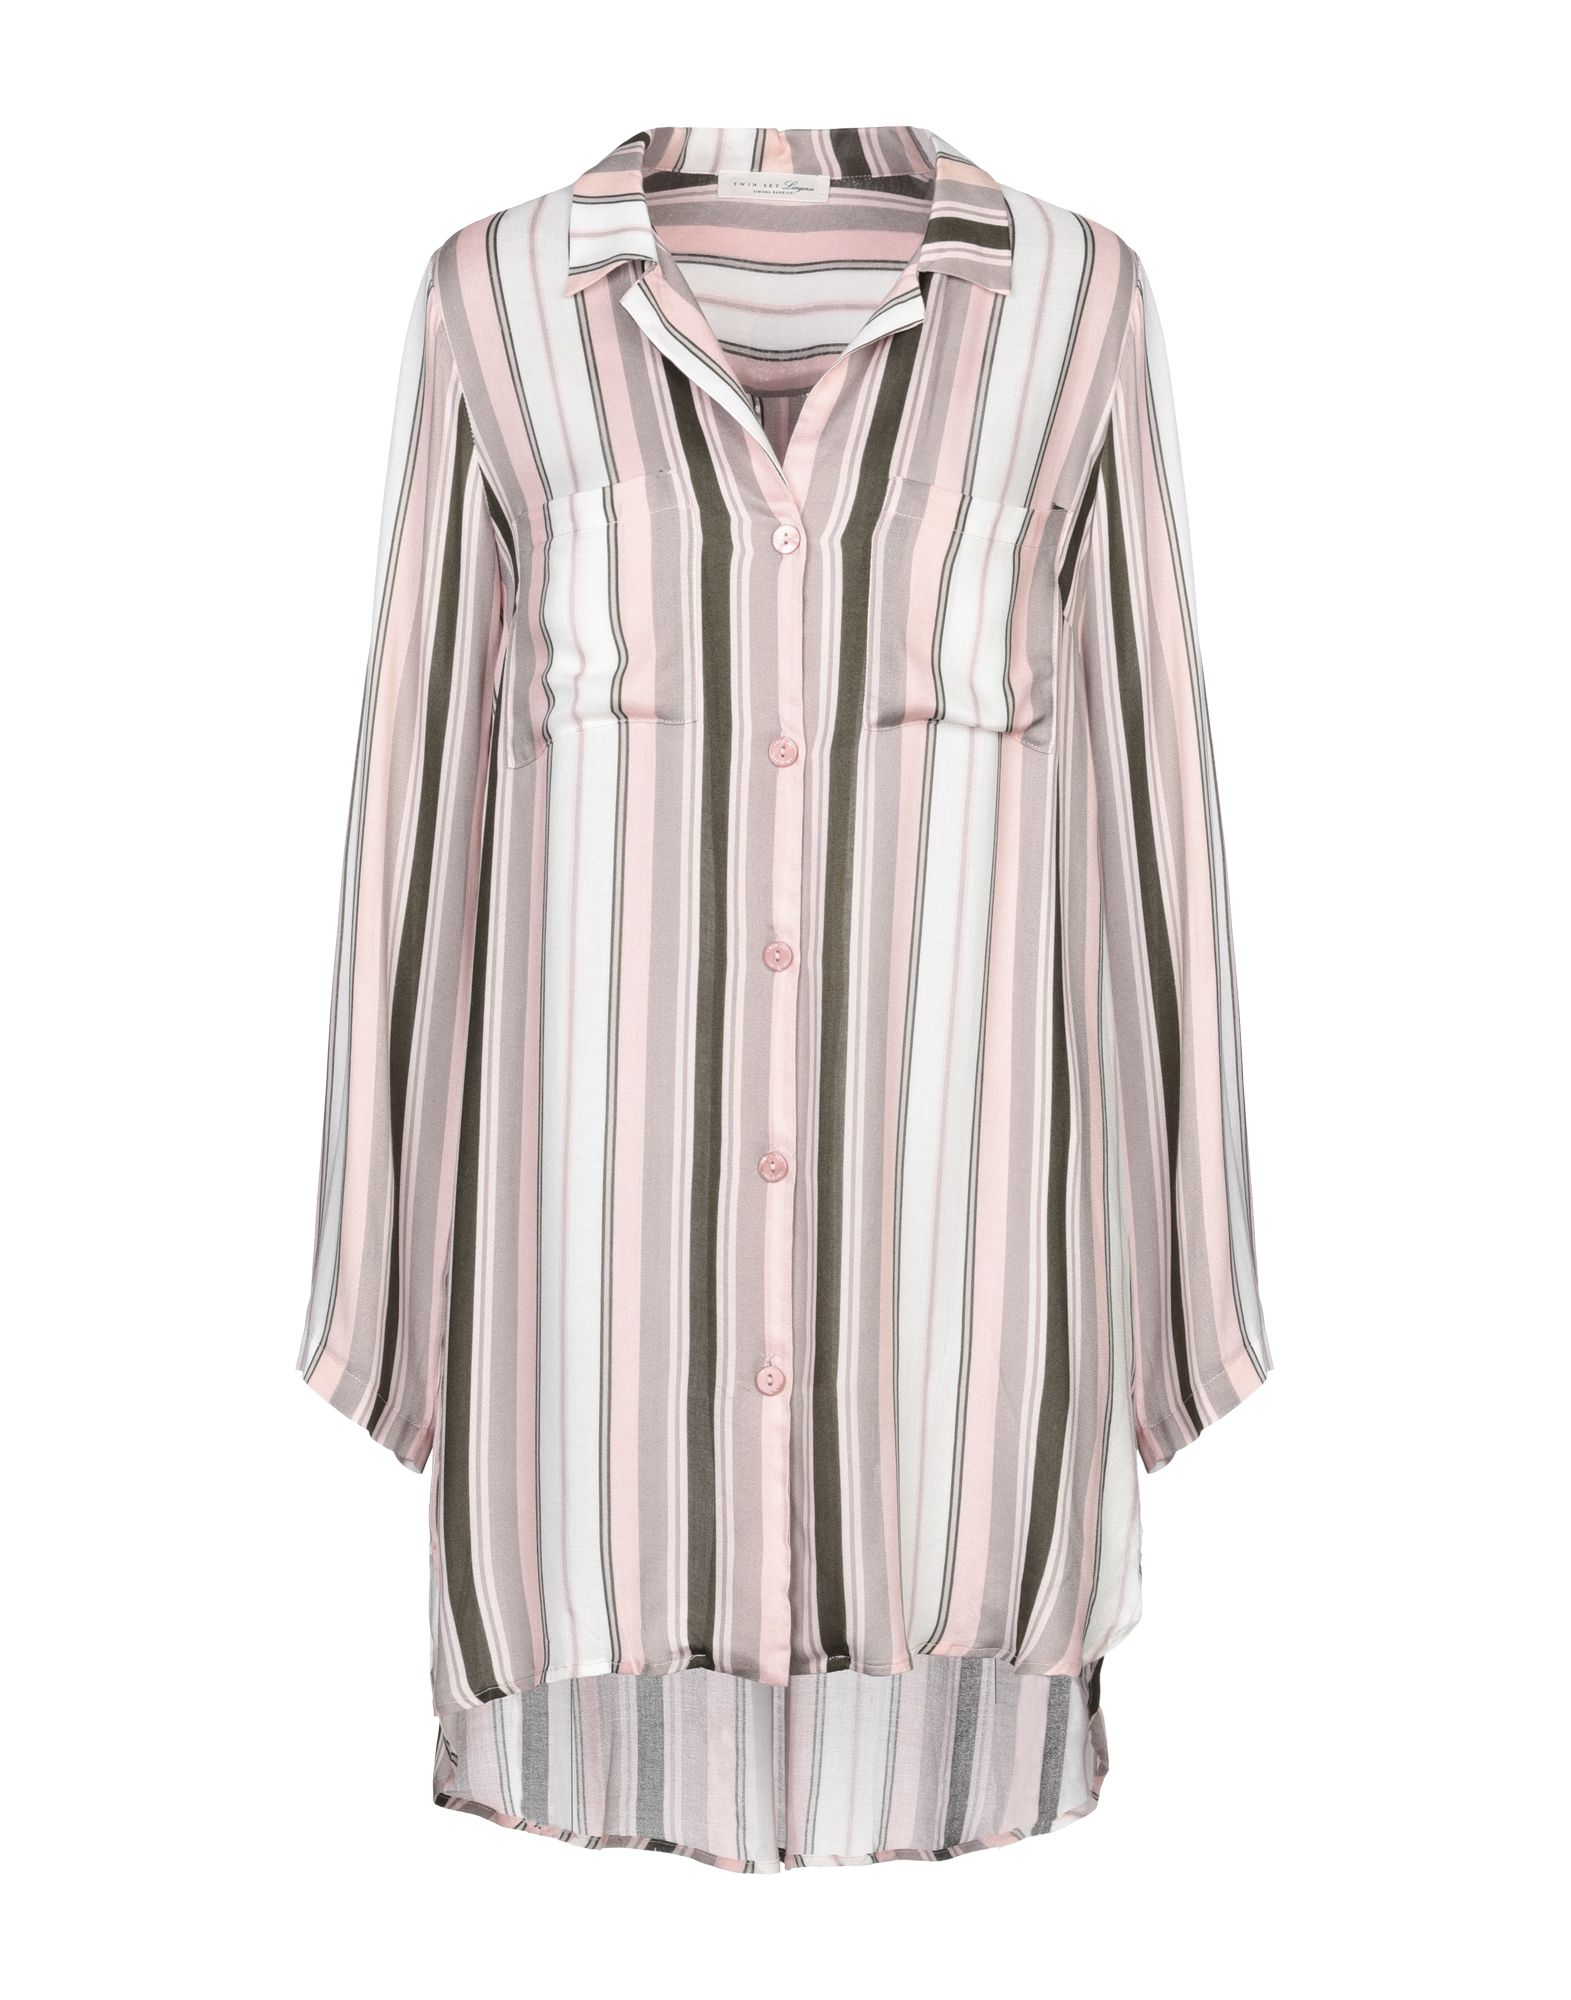 TWINSET UNDERWEAR Ночная рубашка рубашка ночная с макраме